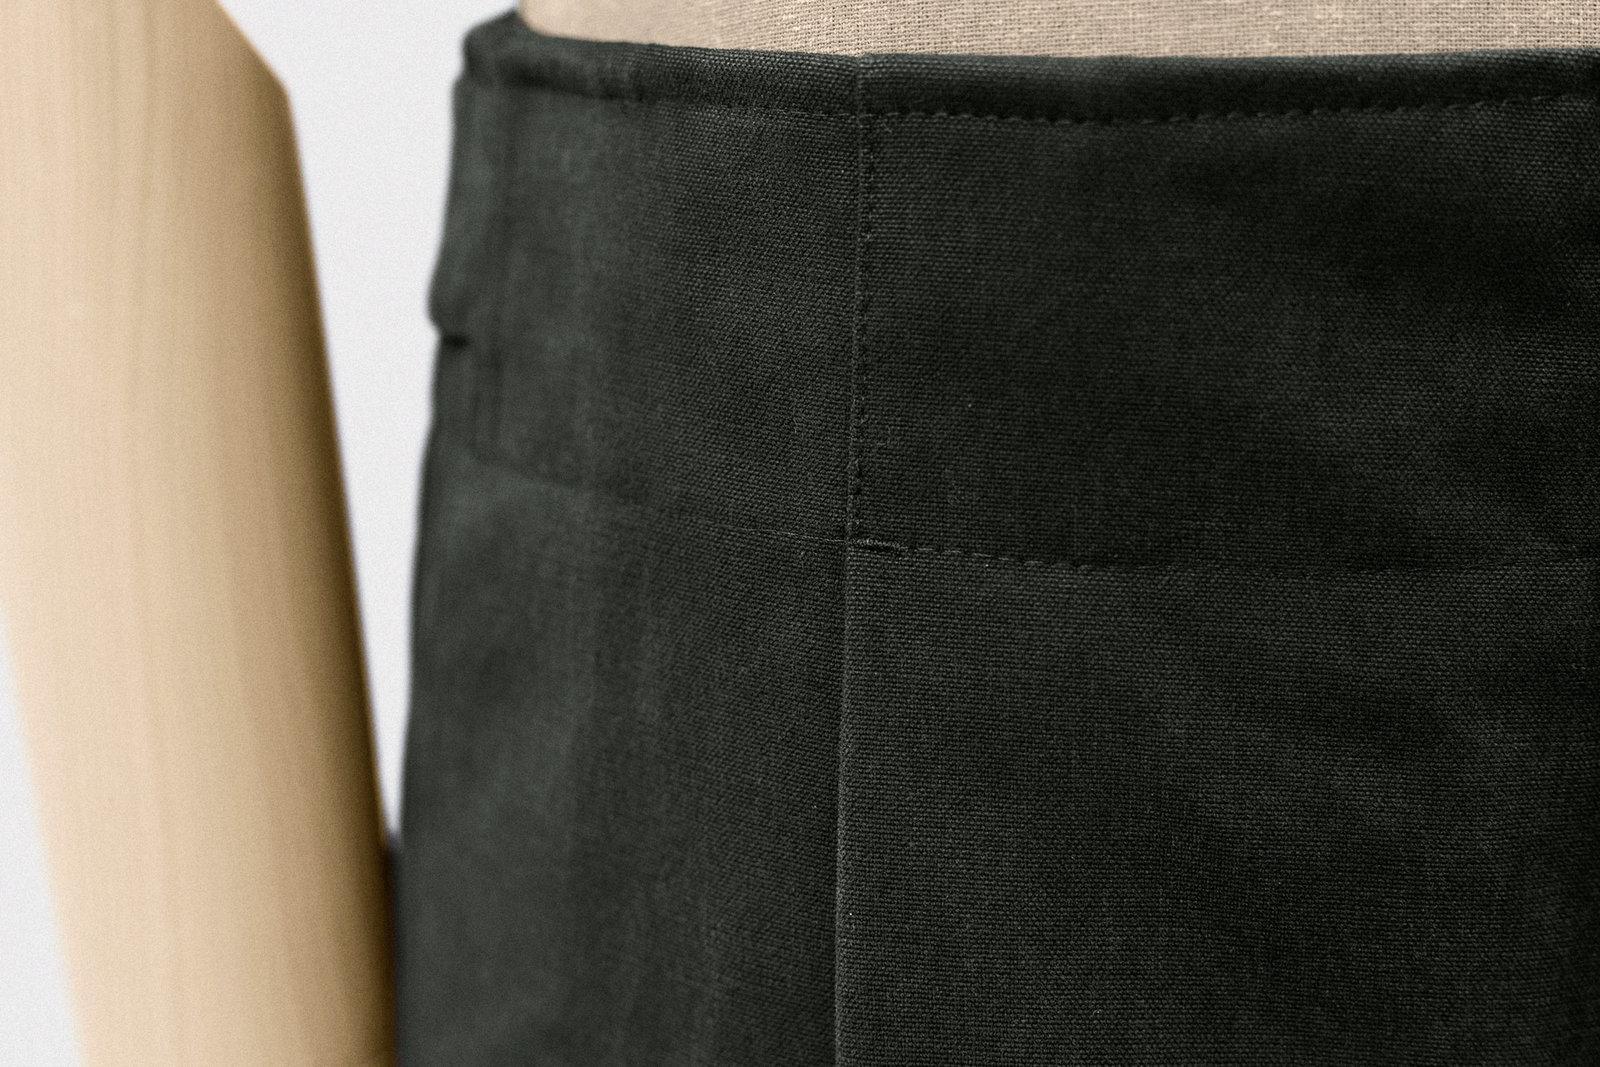 field-trousers-cotton-green-14@2x.jpeg